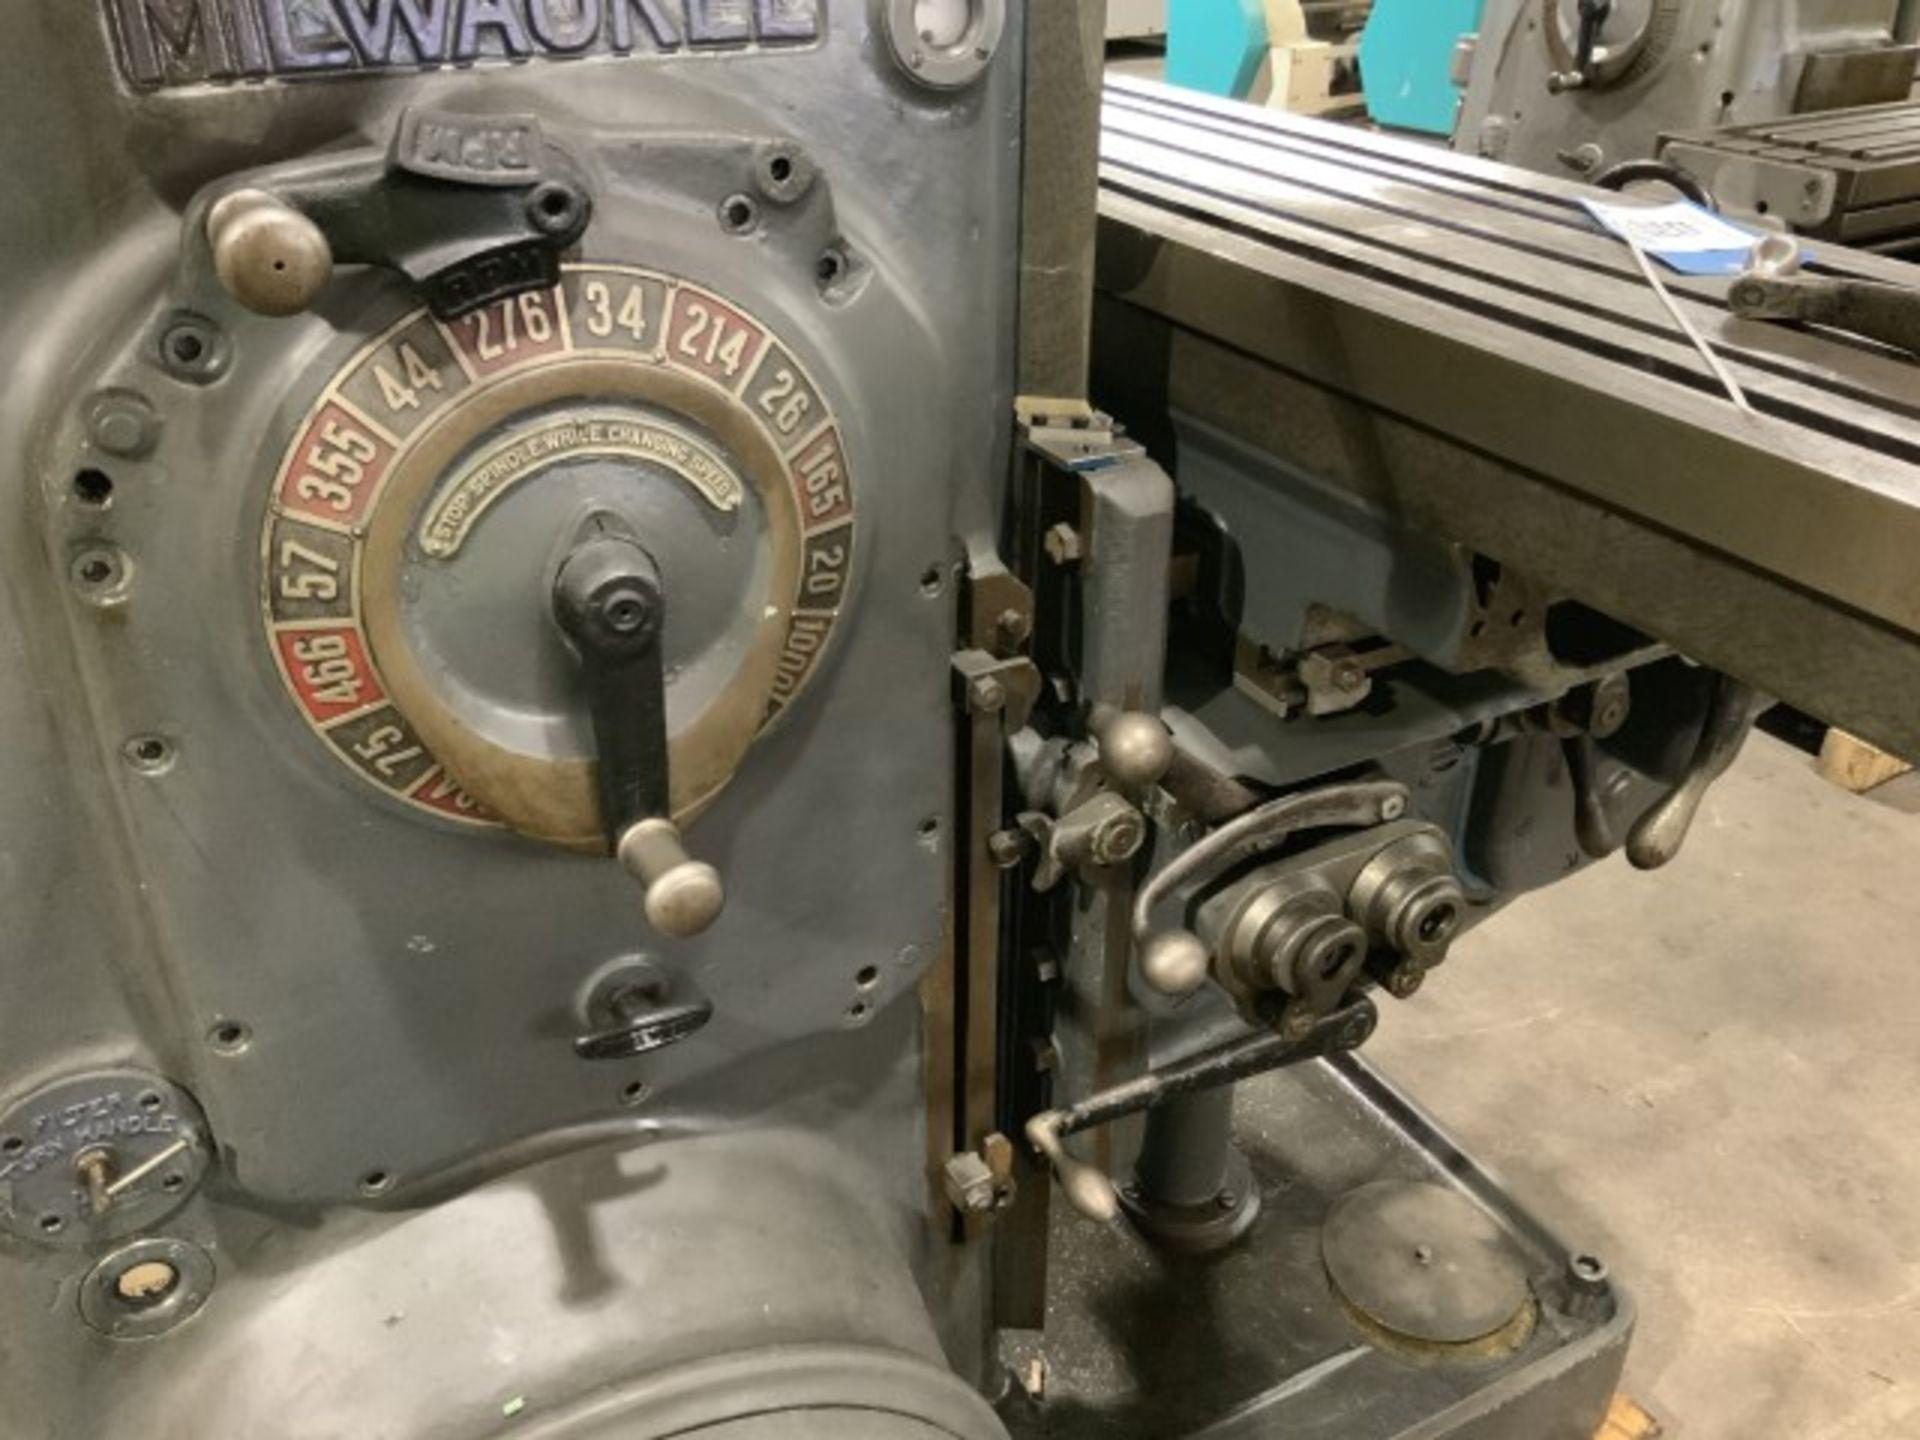 Horizontal milling machine - Image 5 of 6